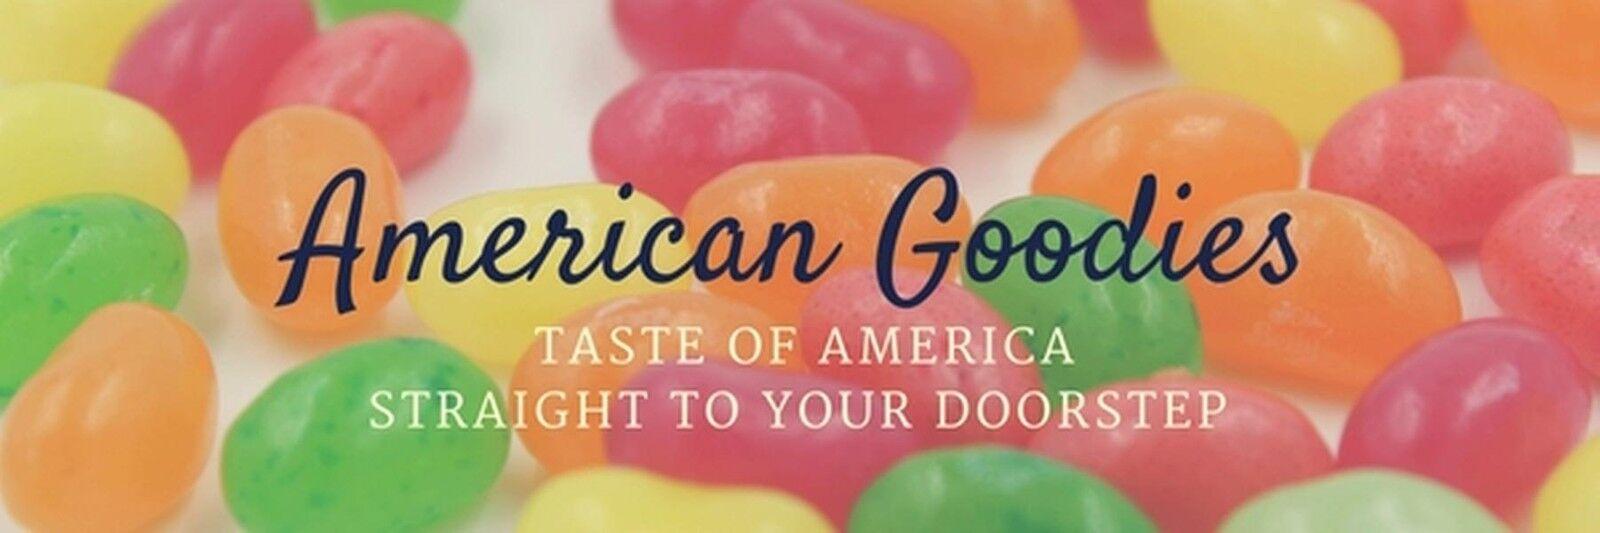 AmericanGoodiesUK